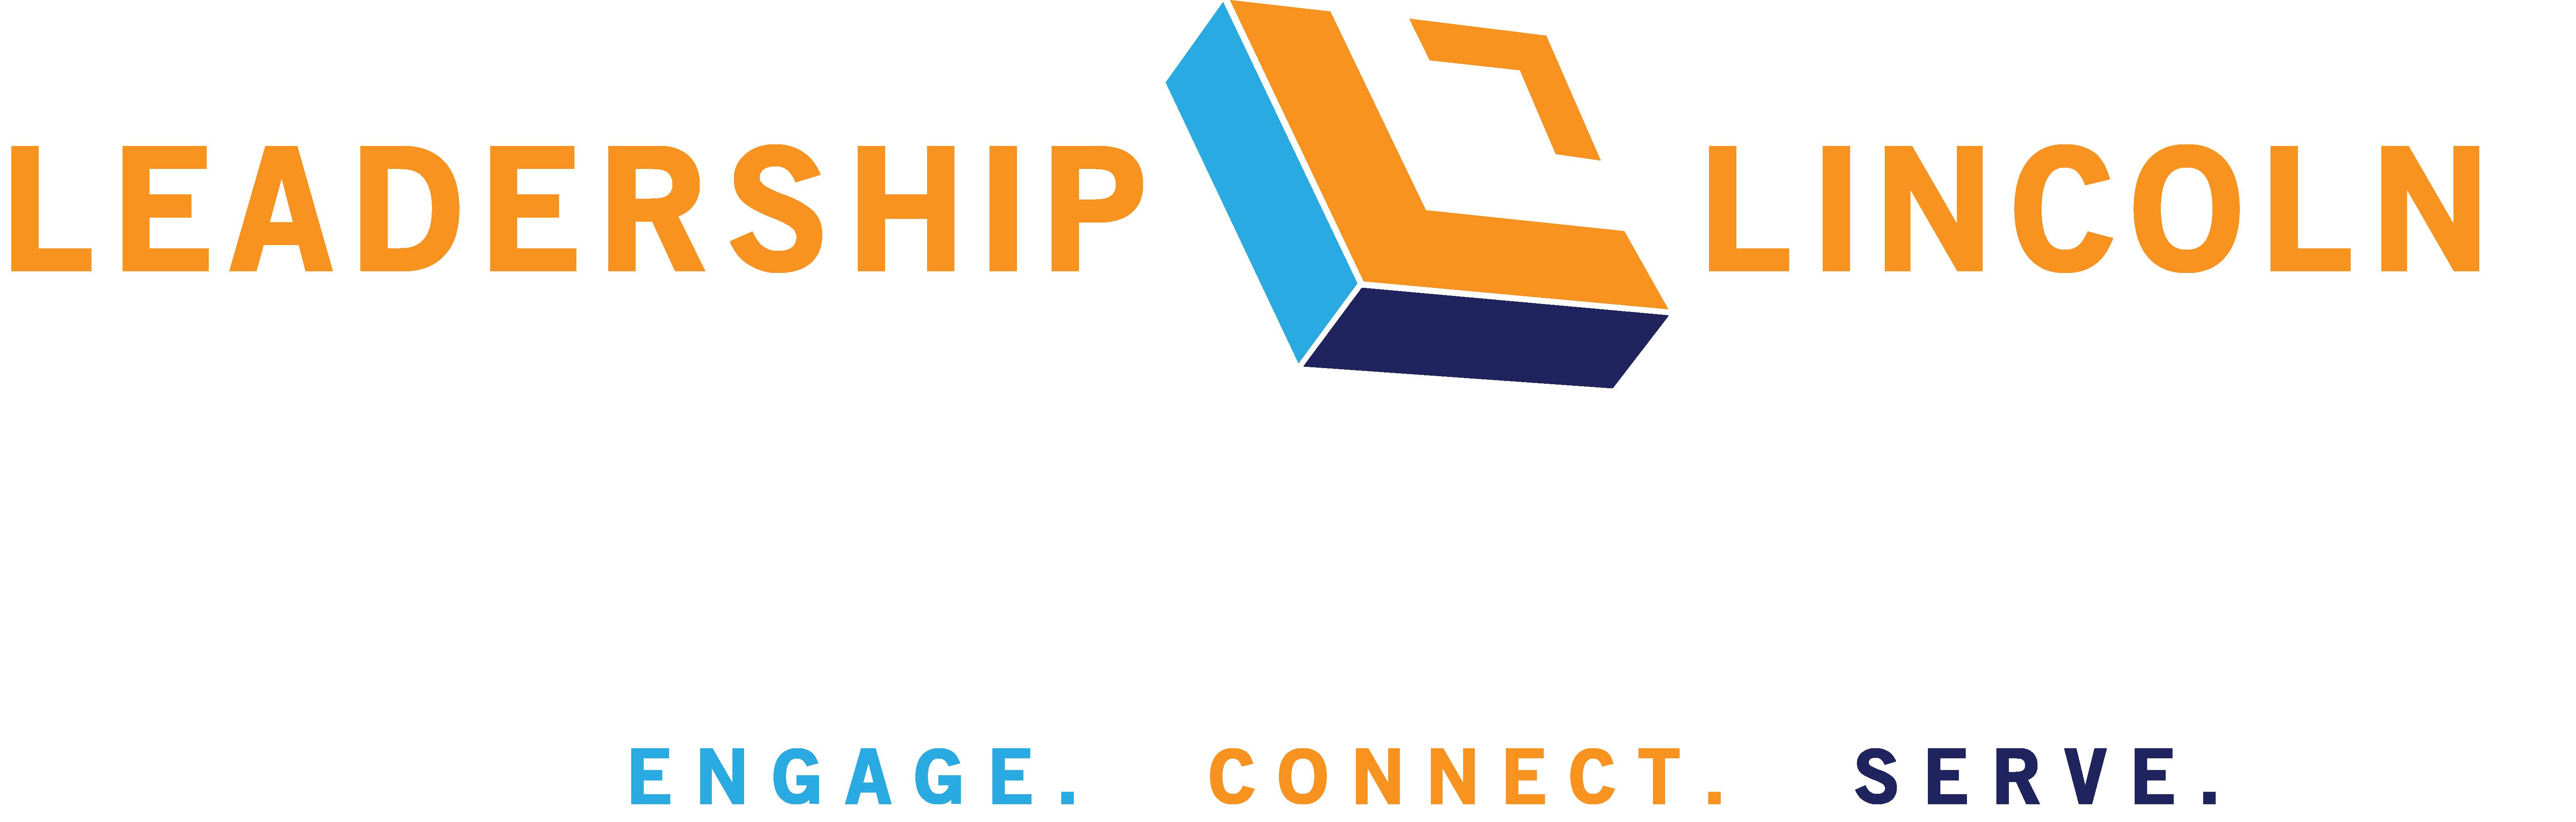 Leadership Lincoln logo